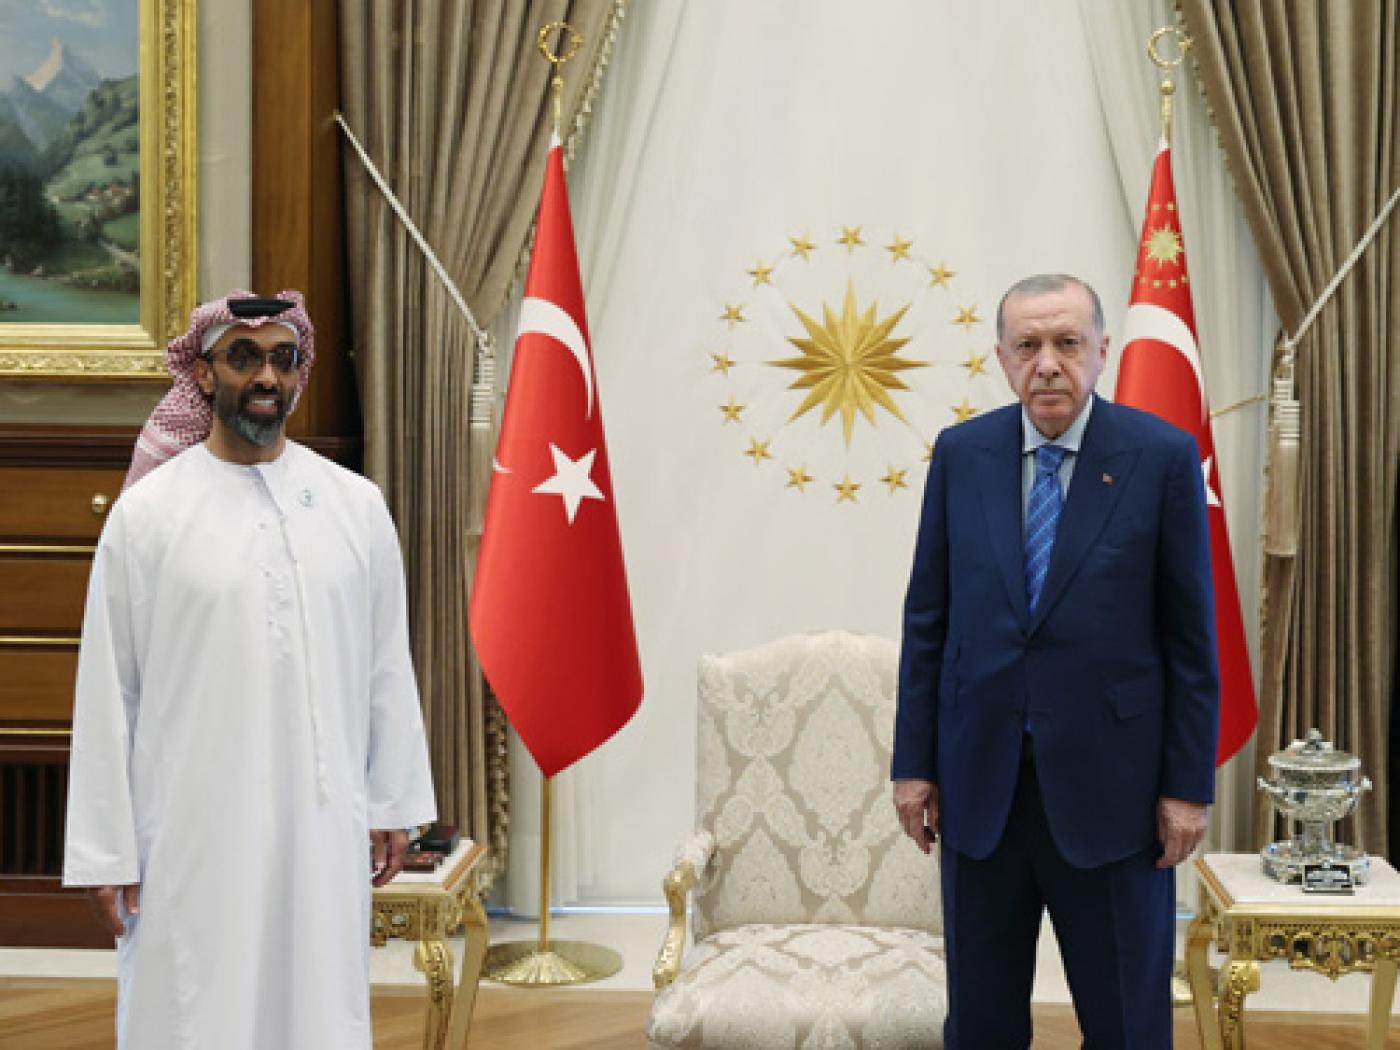 UAE National Security Adviser Sheikh Tahnoun bin Zayed and Turkish President Recep Tayyip Erdogan meet in Ankara on 18 August 2021 (Turkish Presidency)